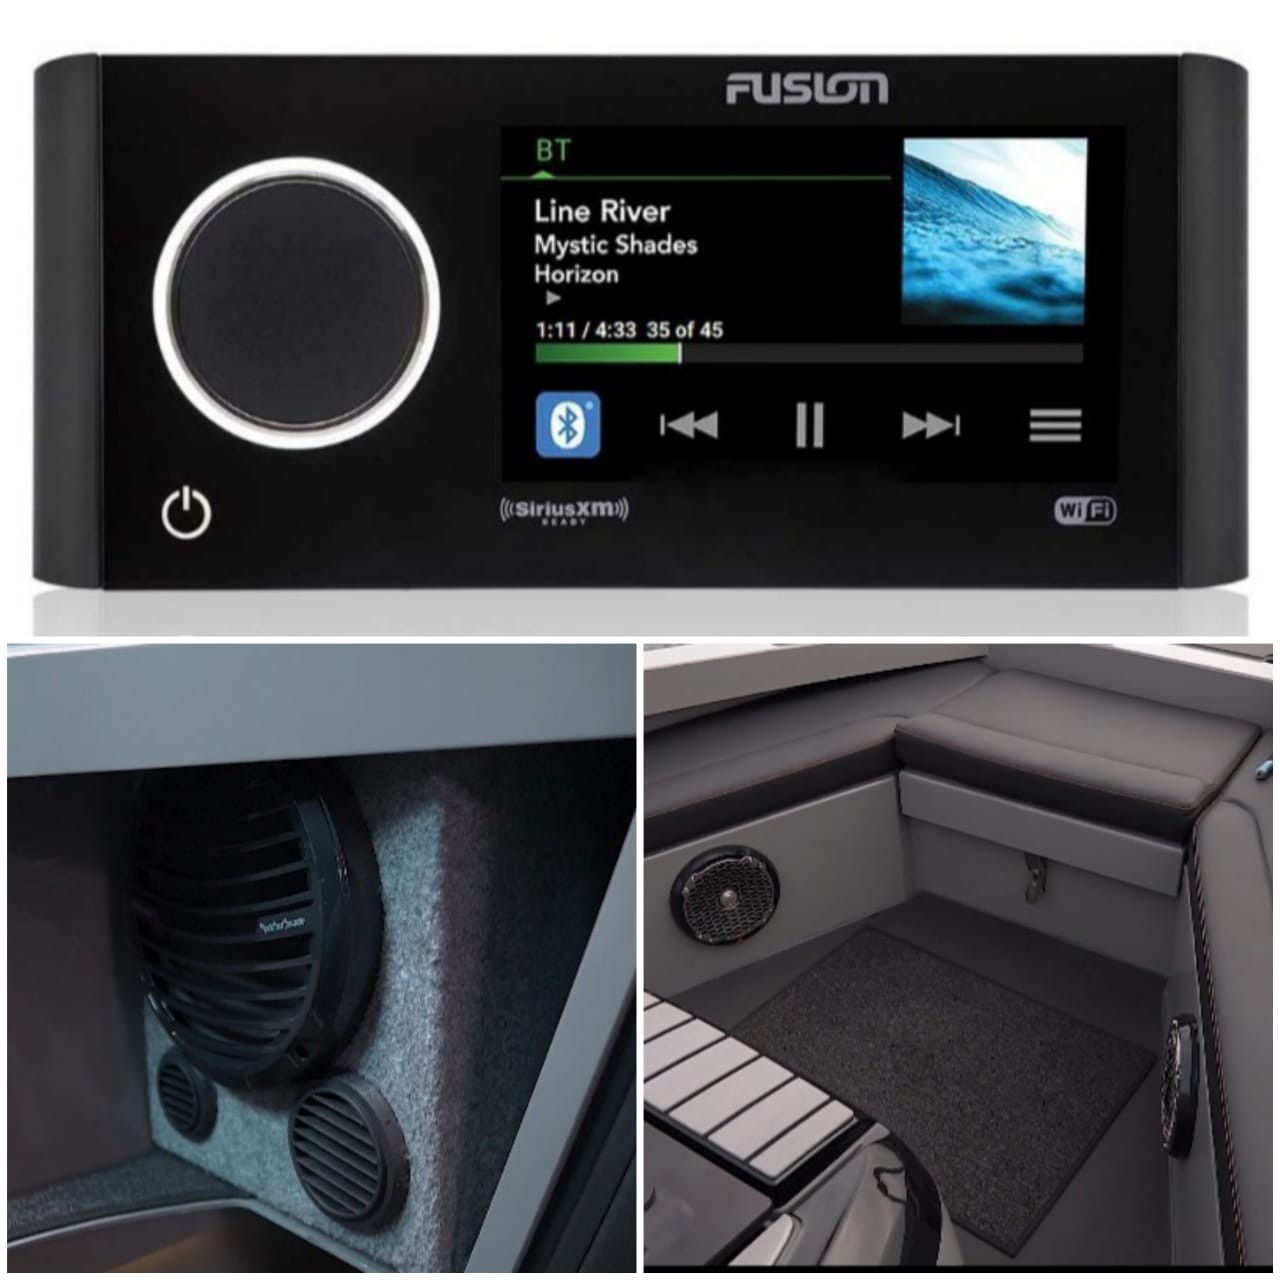 Аудиосистема Fusion, вкл. 6 динамиков и сабвуфер